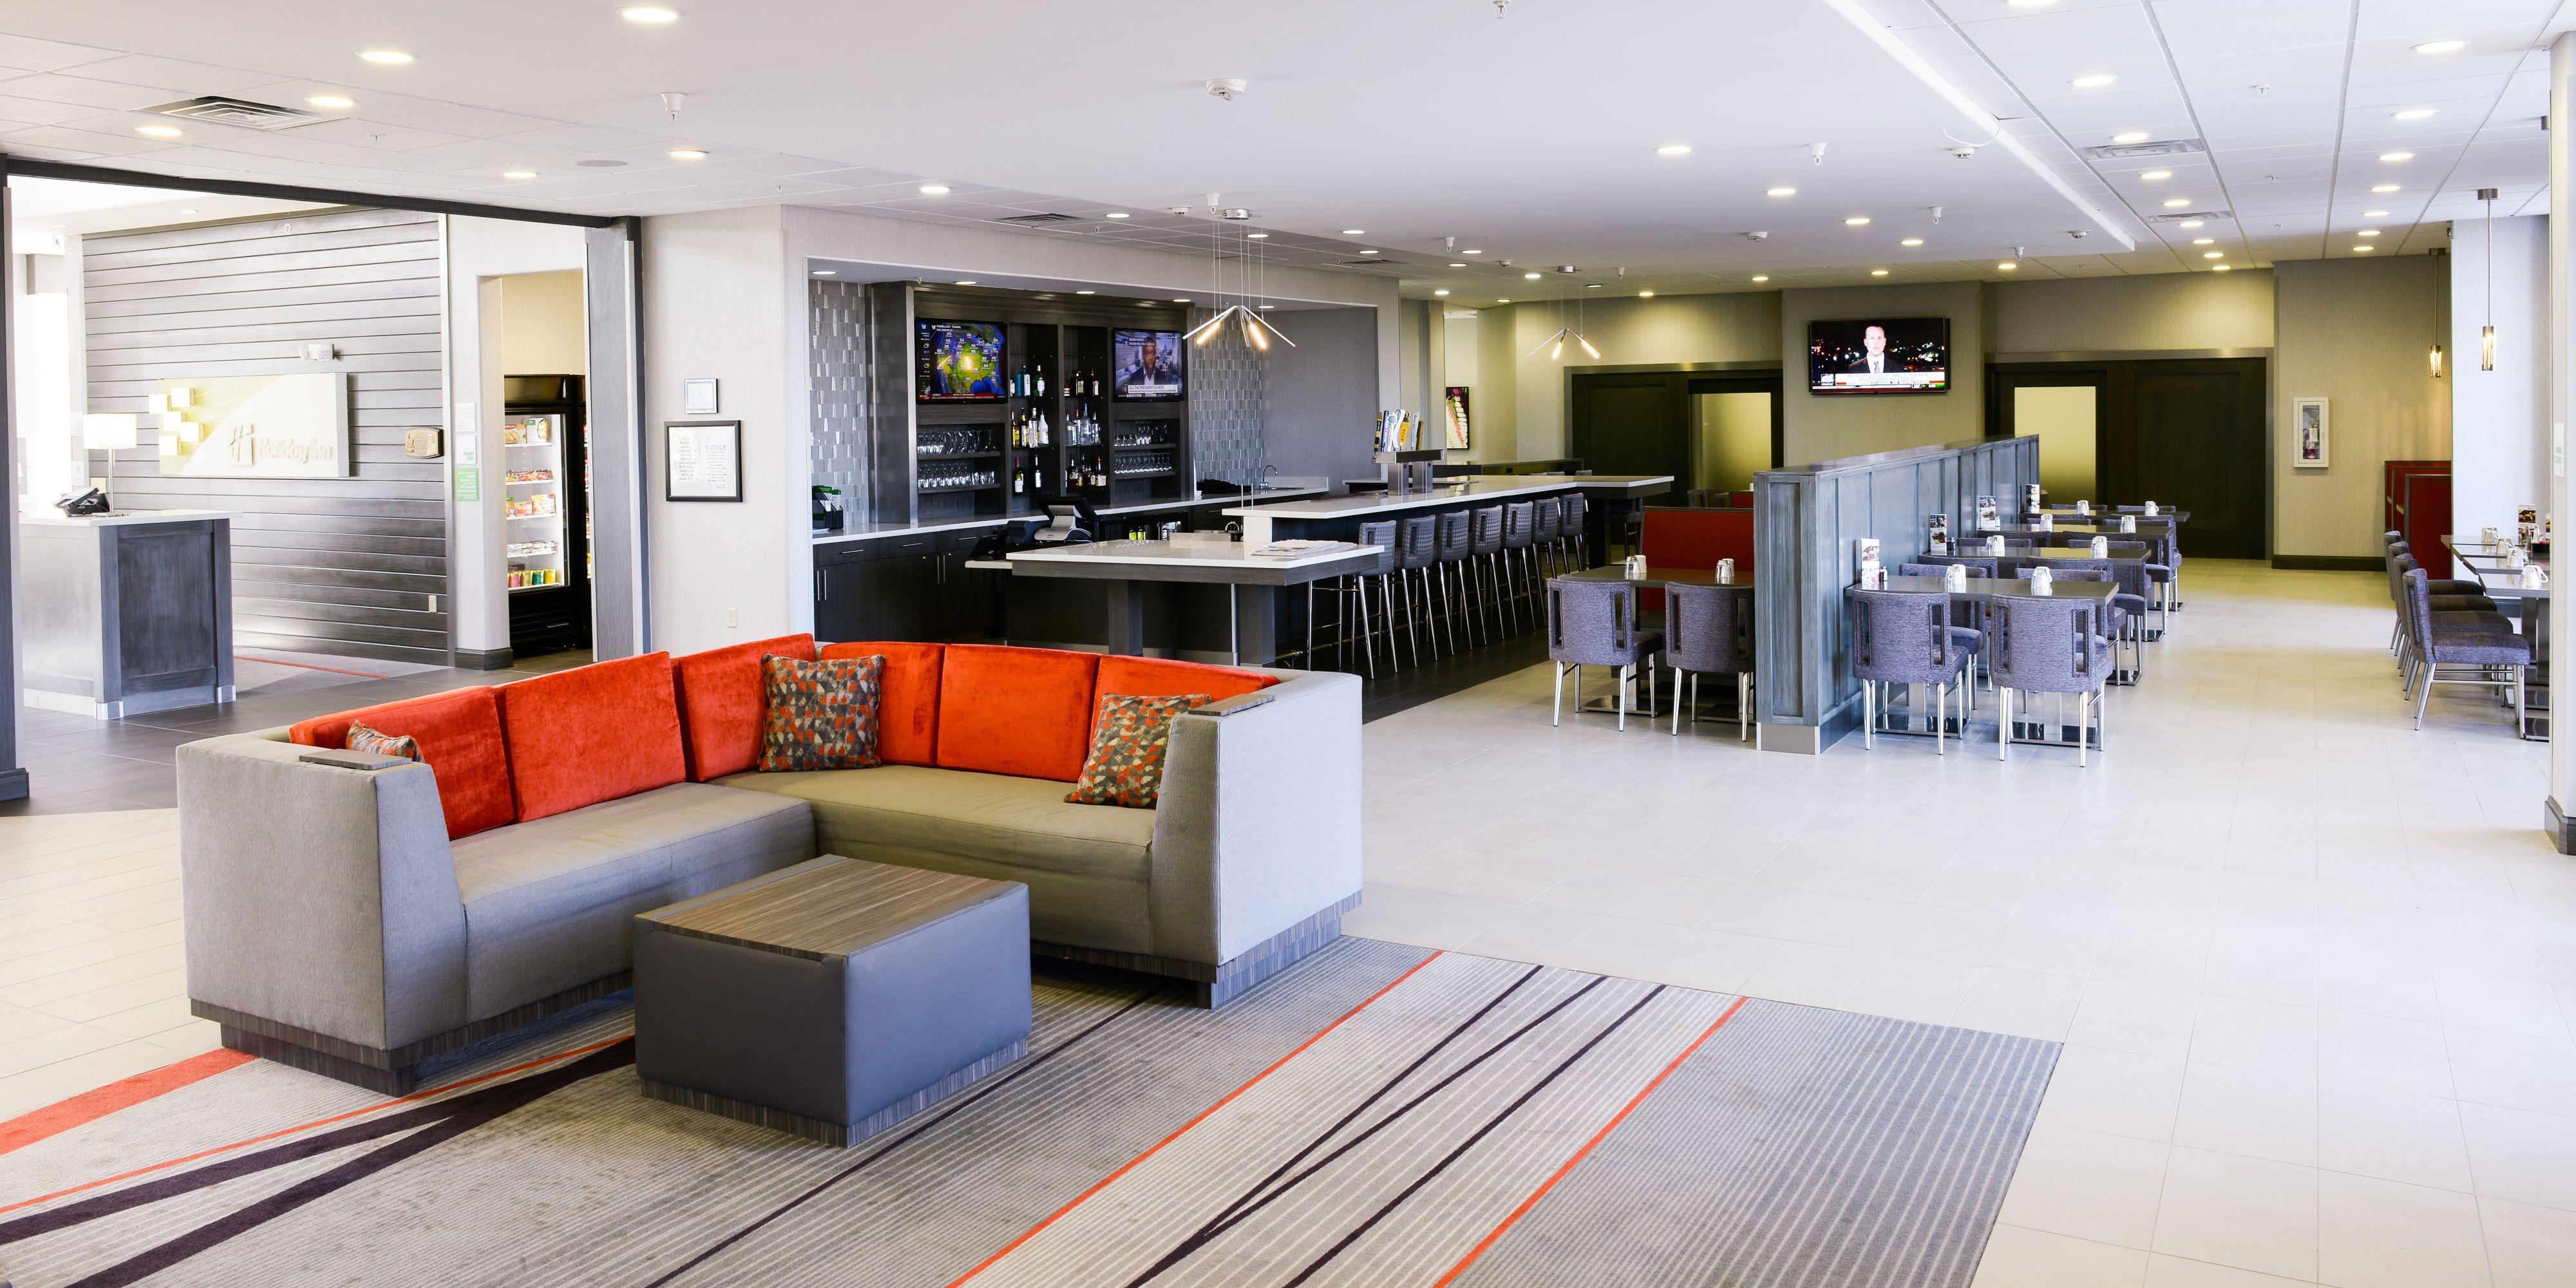 Holiday Inn Abilene - North College Area image 4